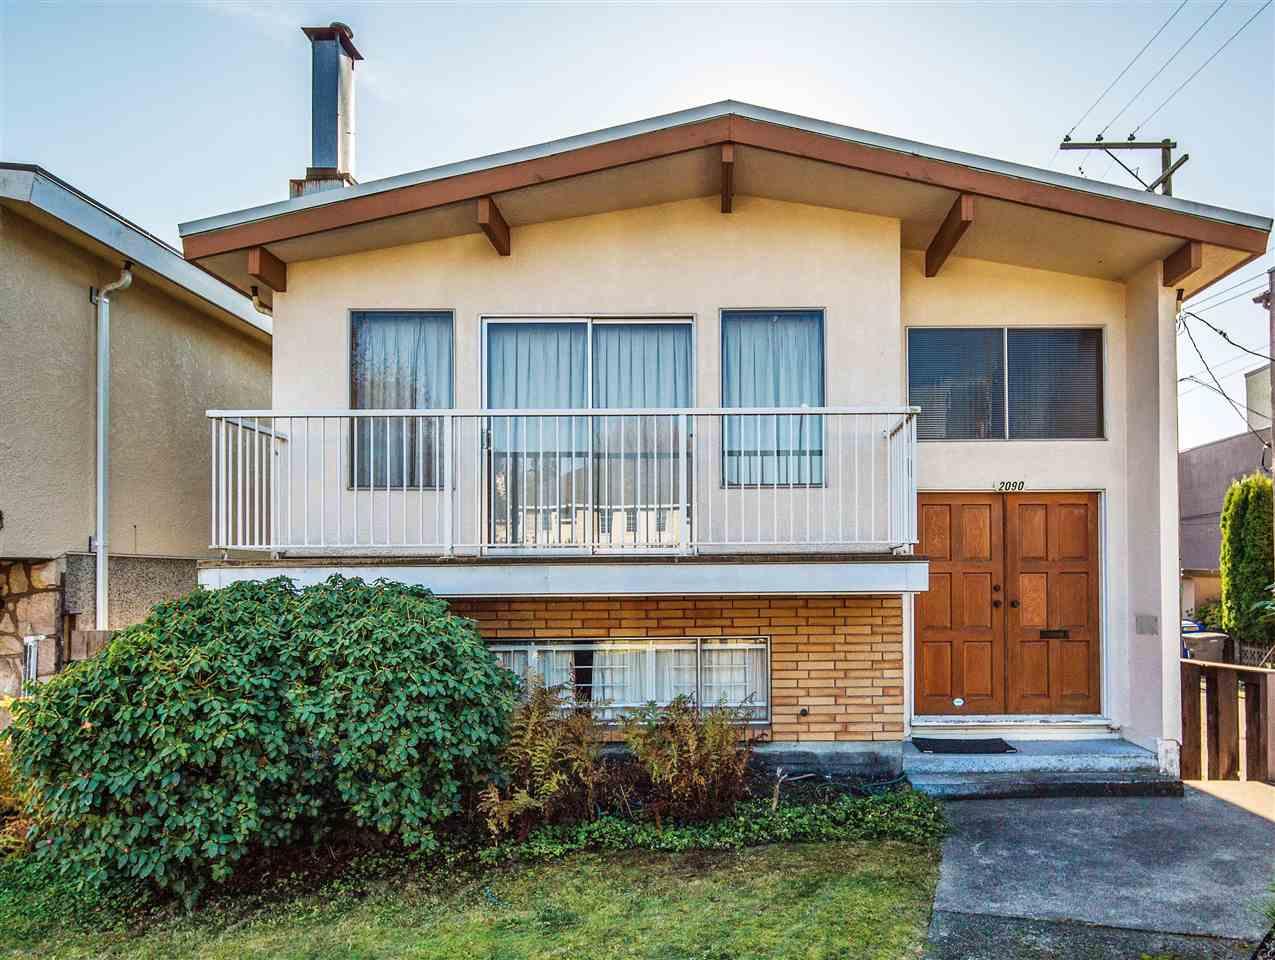 2090 W 44TH Kerrisdale, Vancouver (R2224160)